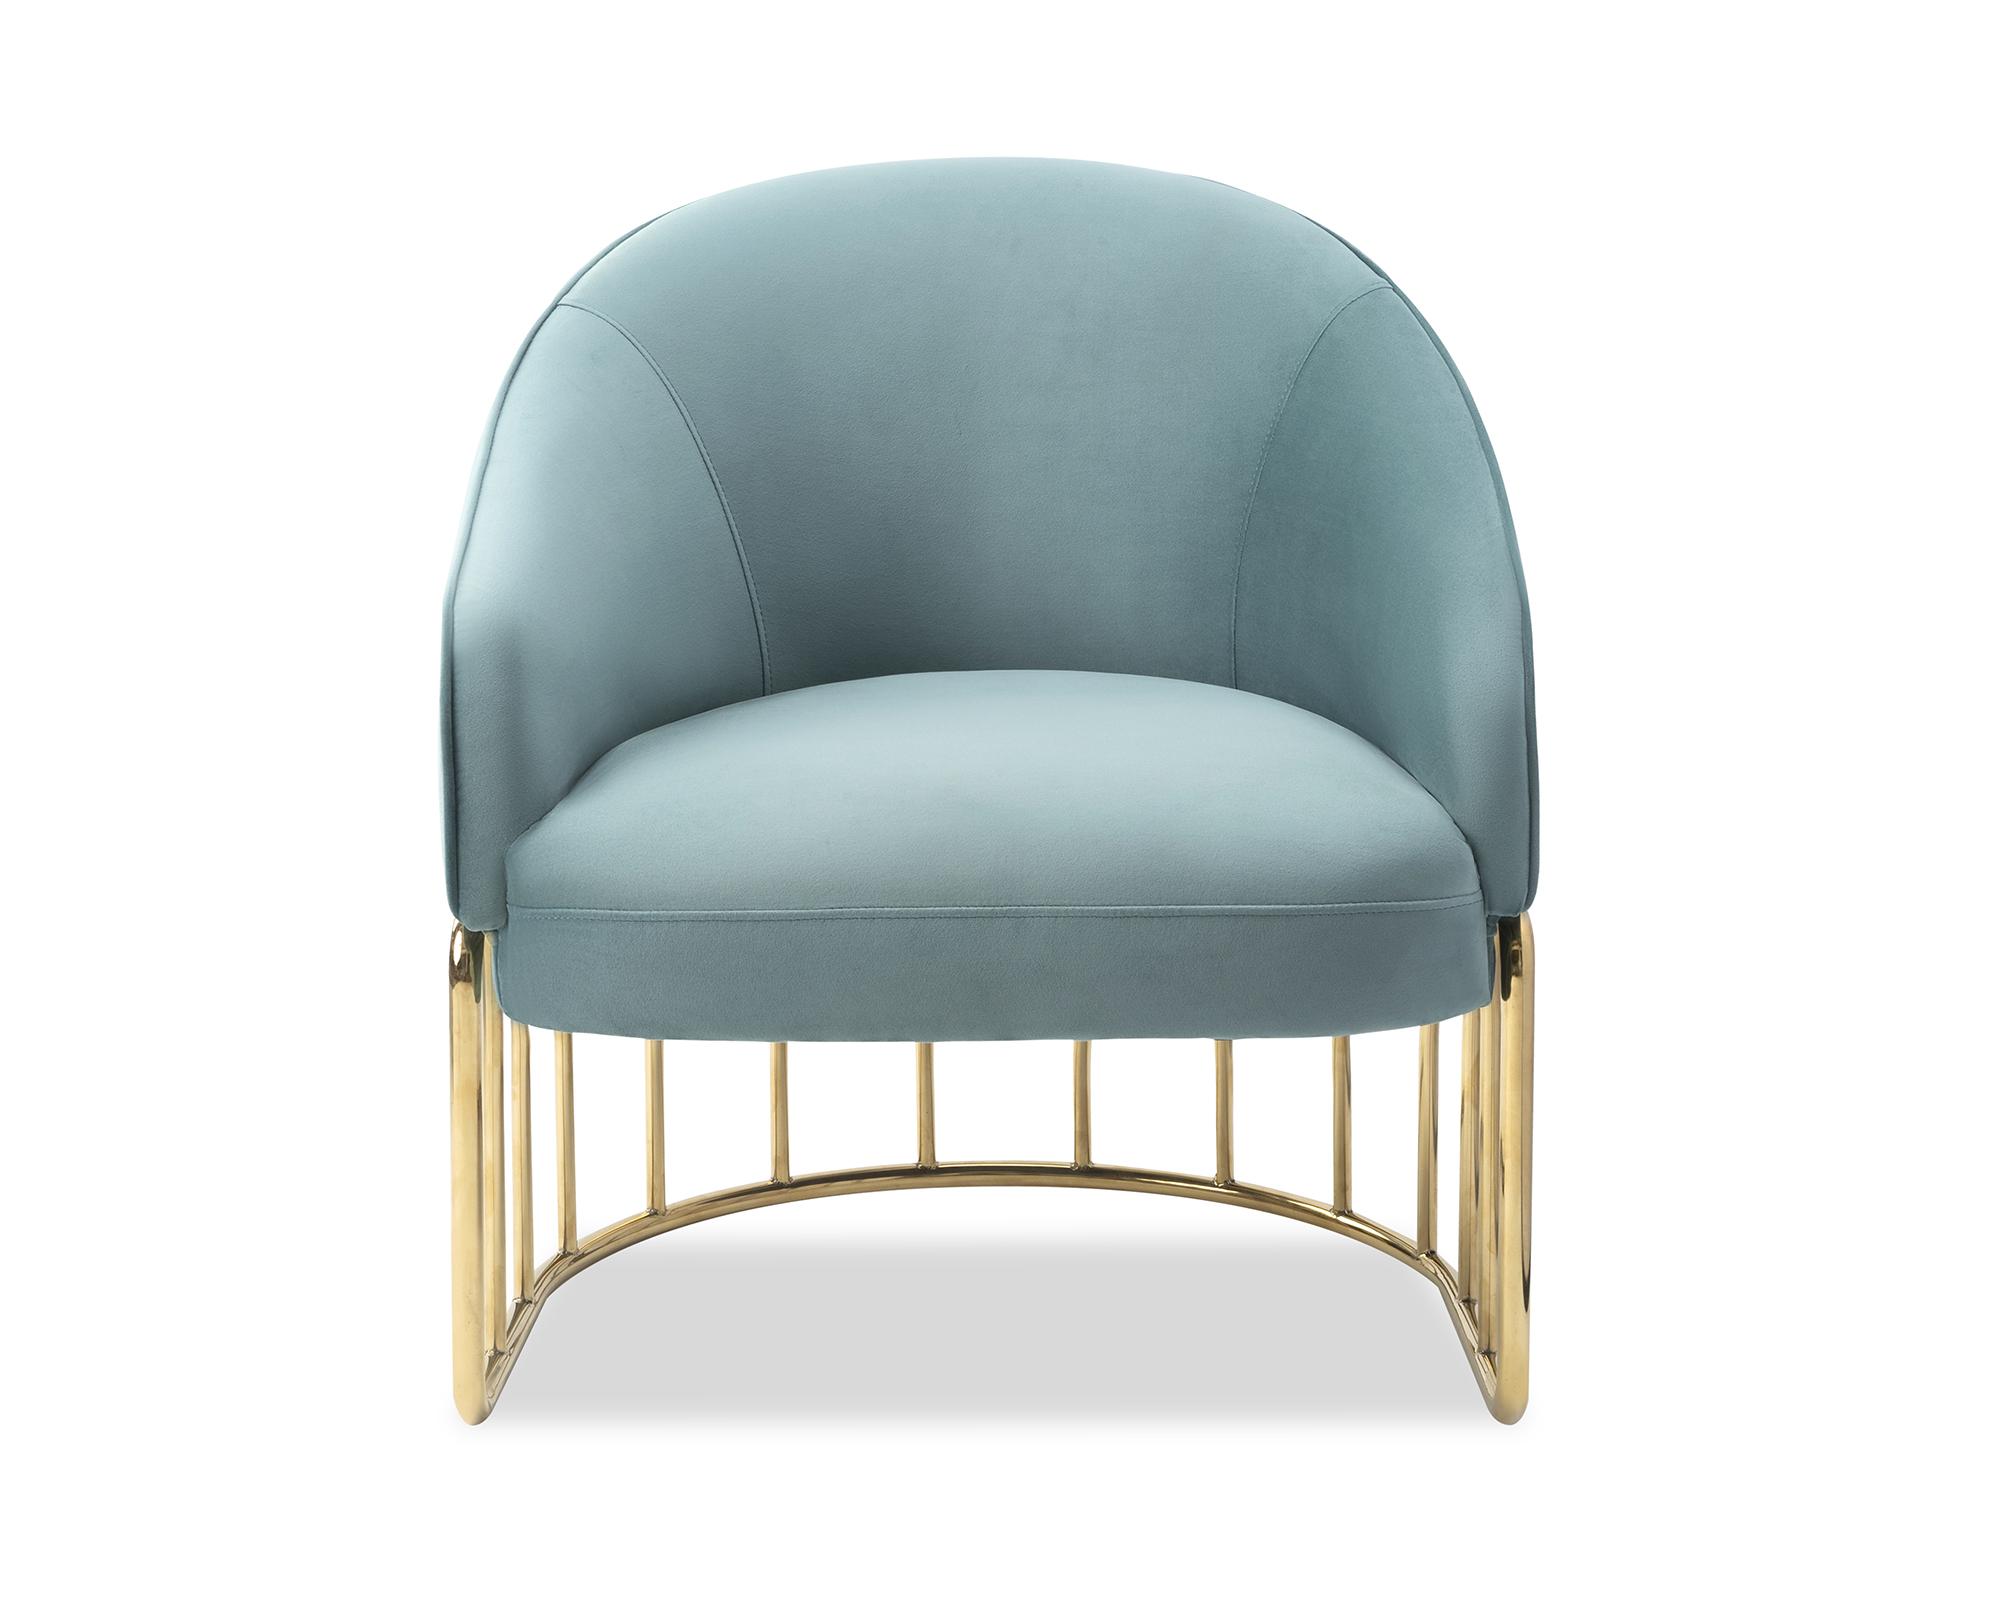 Liang & Eimil Boston Occasional Chair Deep Turquoise Velvet BH-OCH-133 (2)